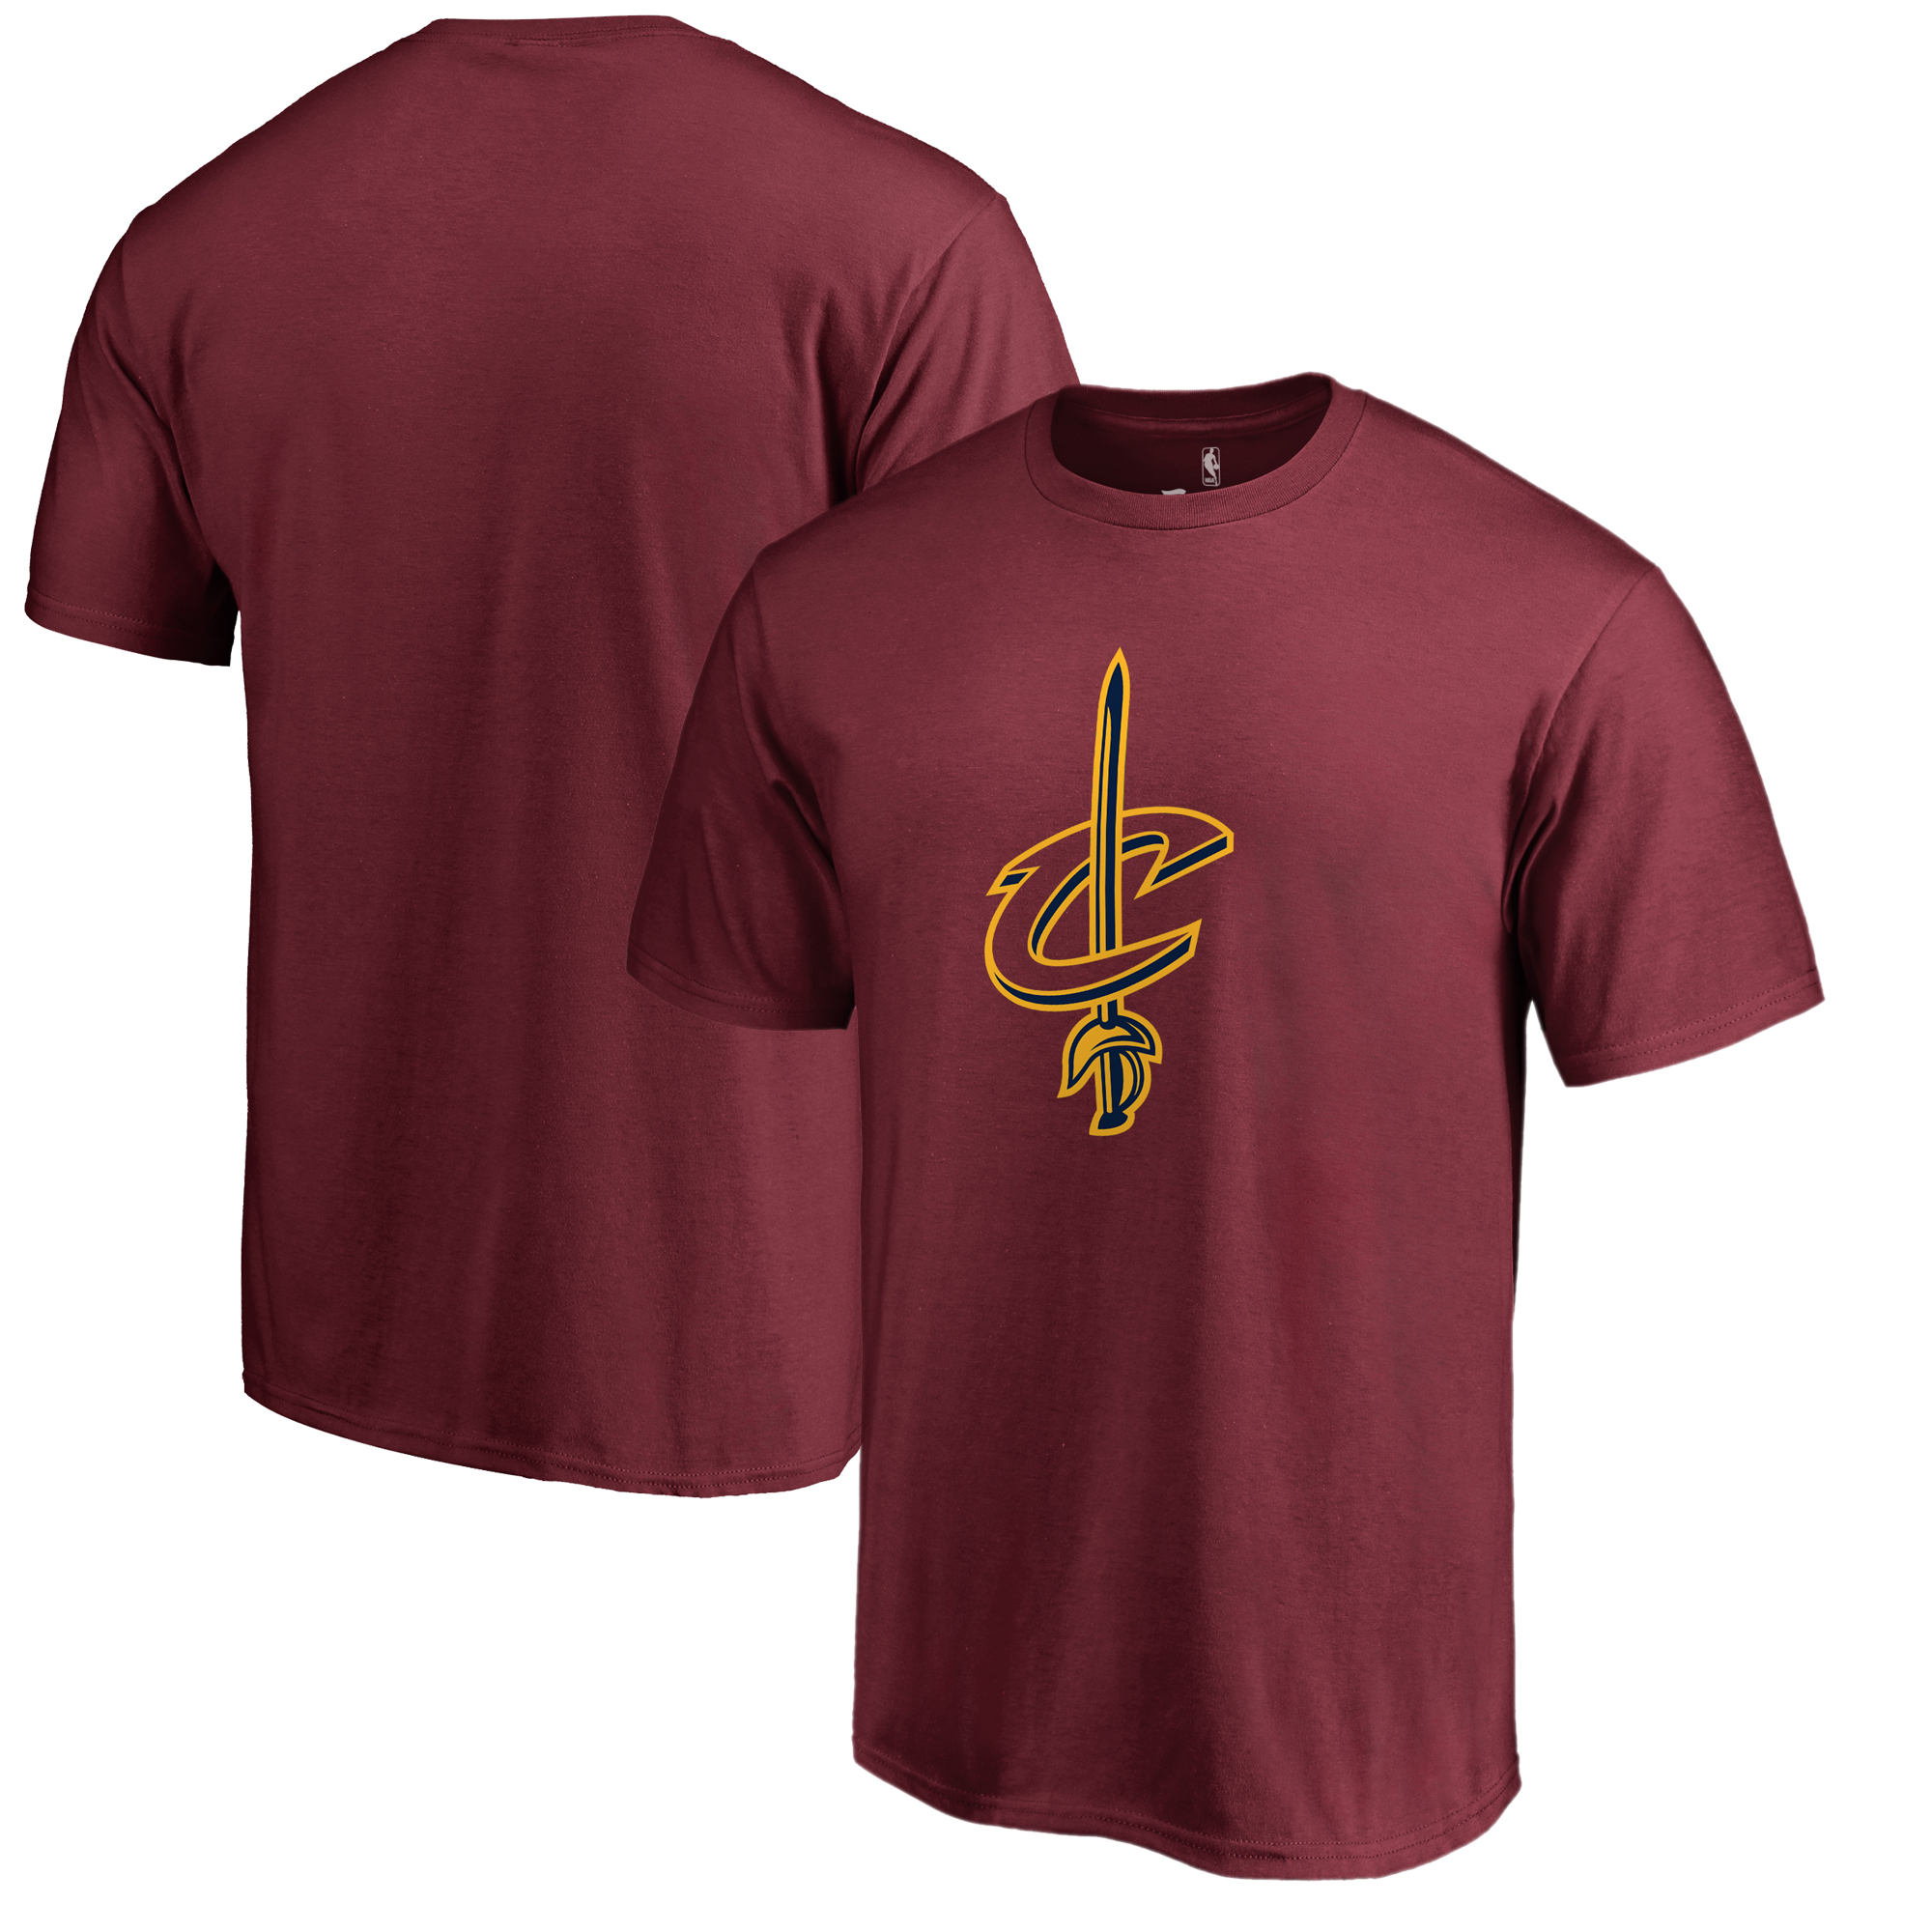 Cleveland Cavaliers Fanatics Branded Big & Tall Team Primary Logo T-Shirt - Wine